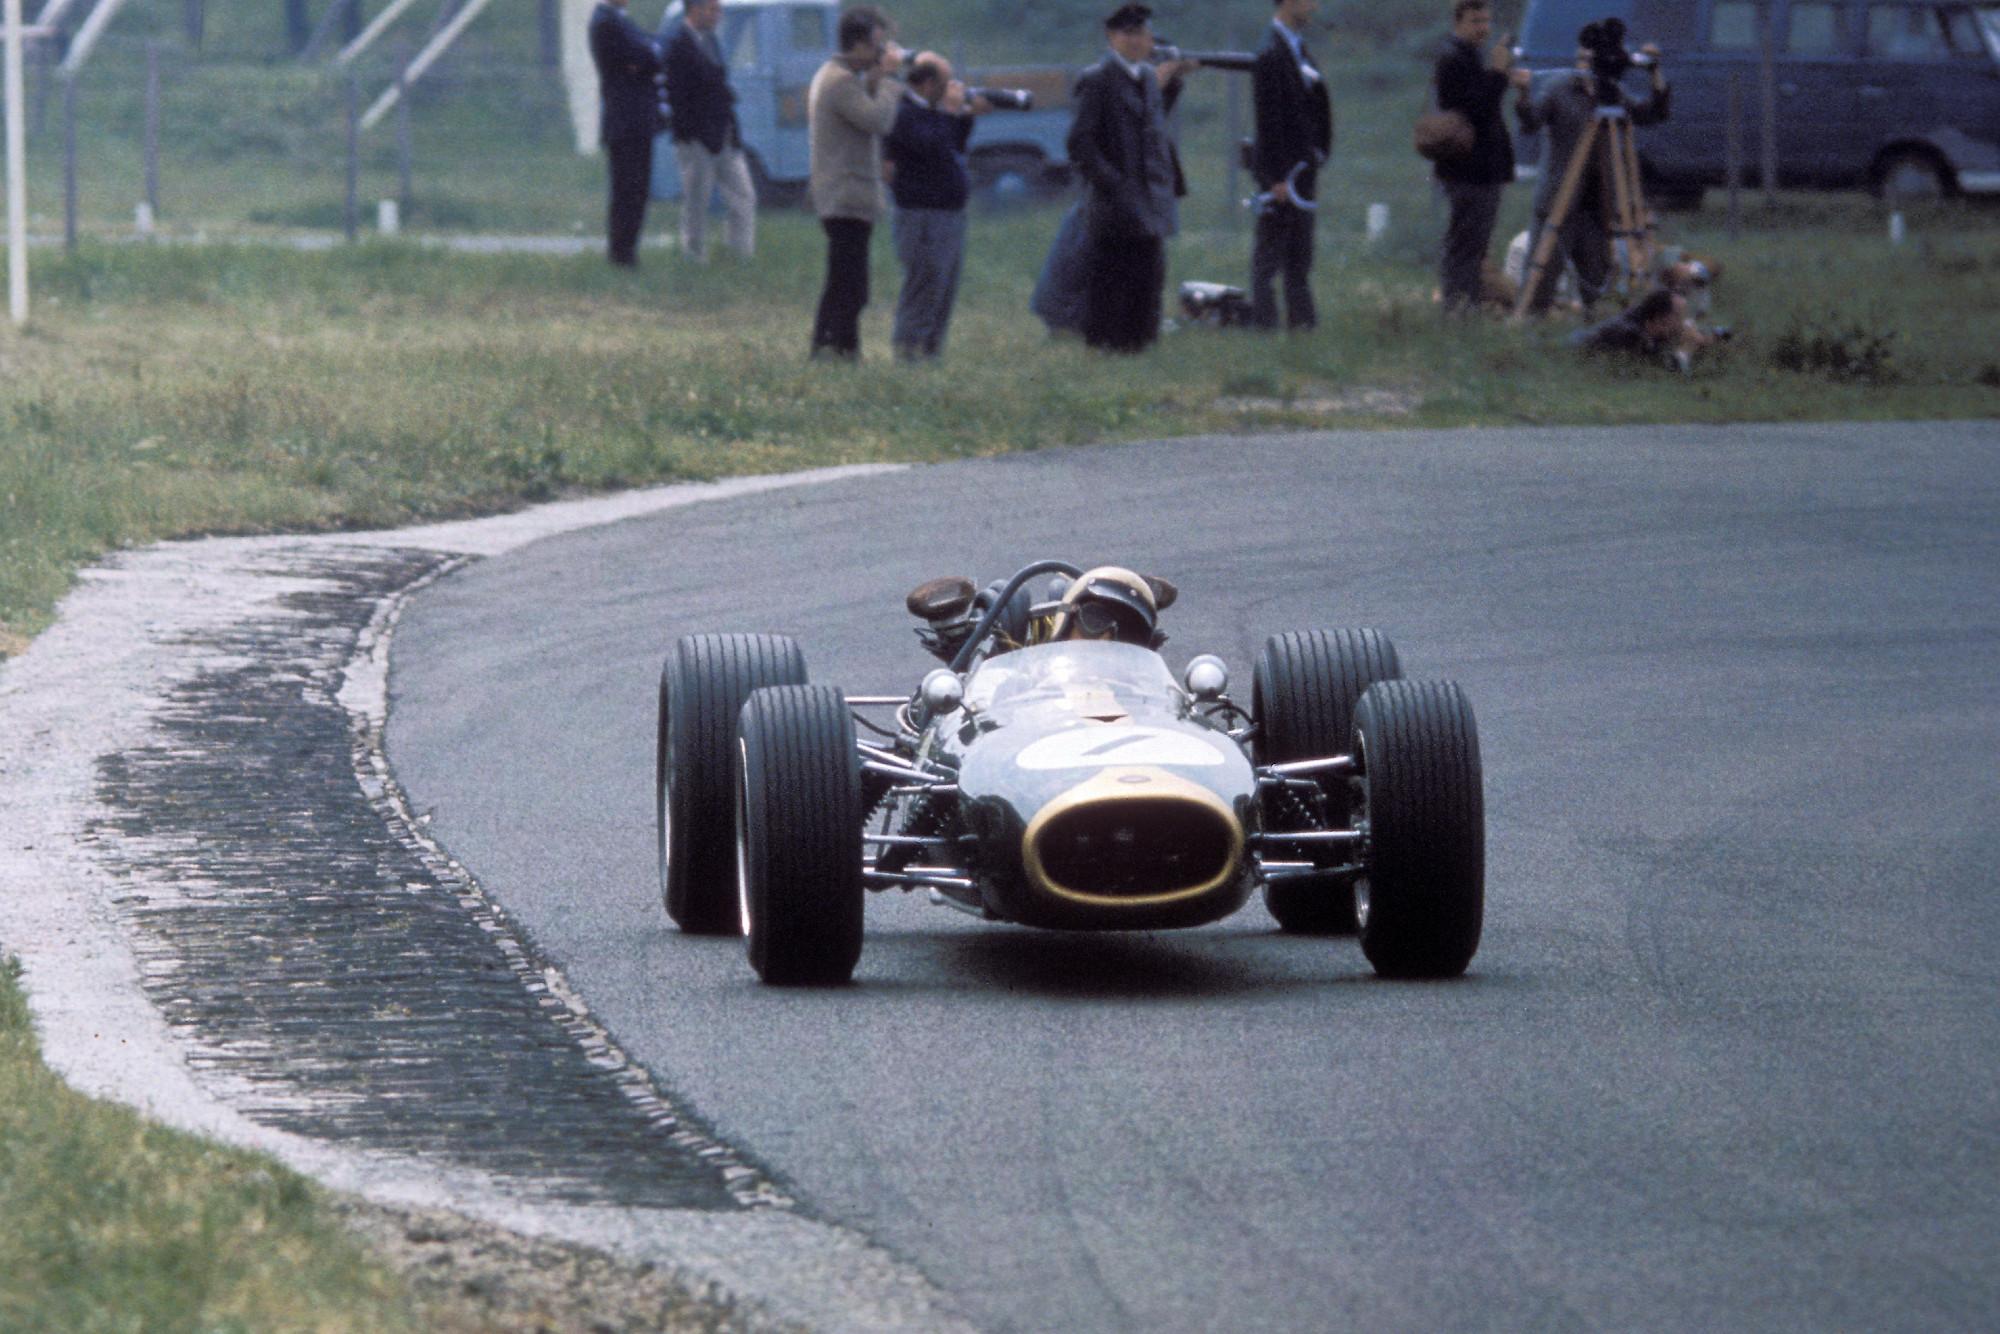 Jack Brabham in the Brabham Repco in 1966